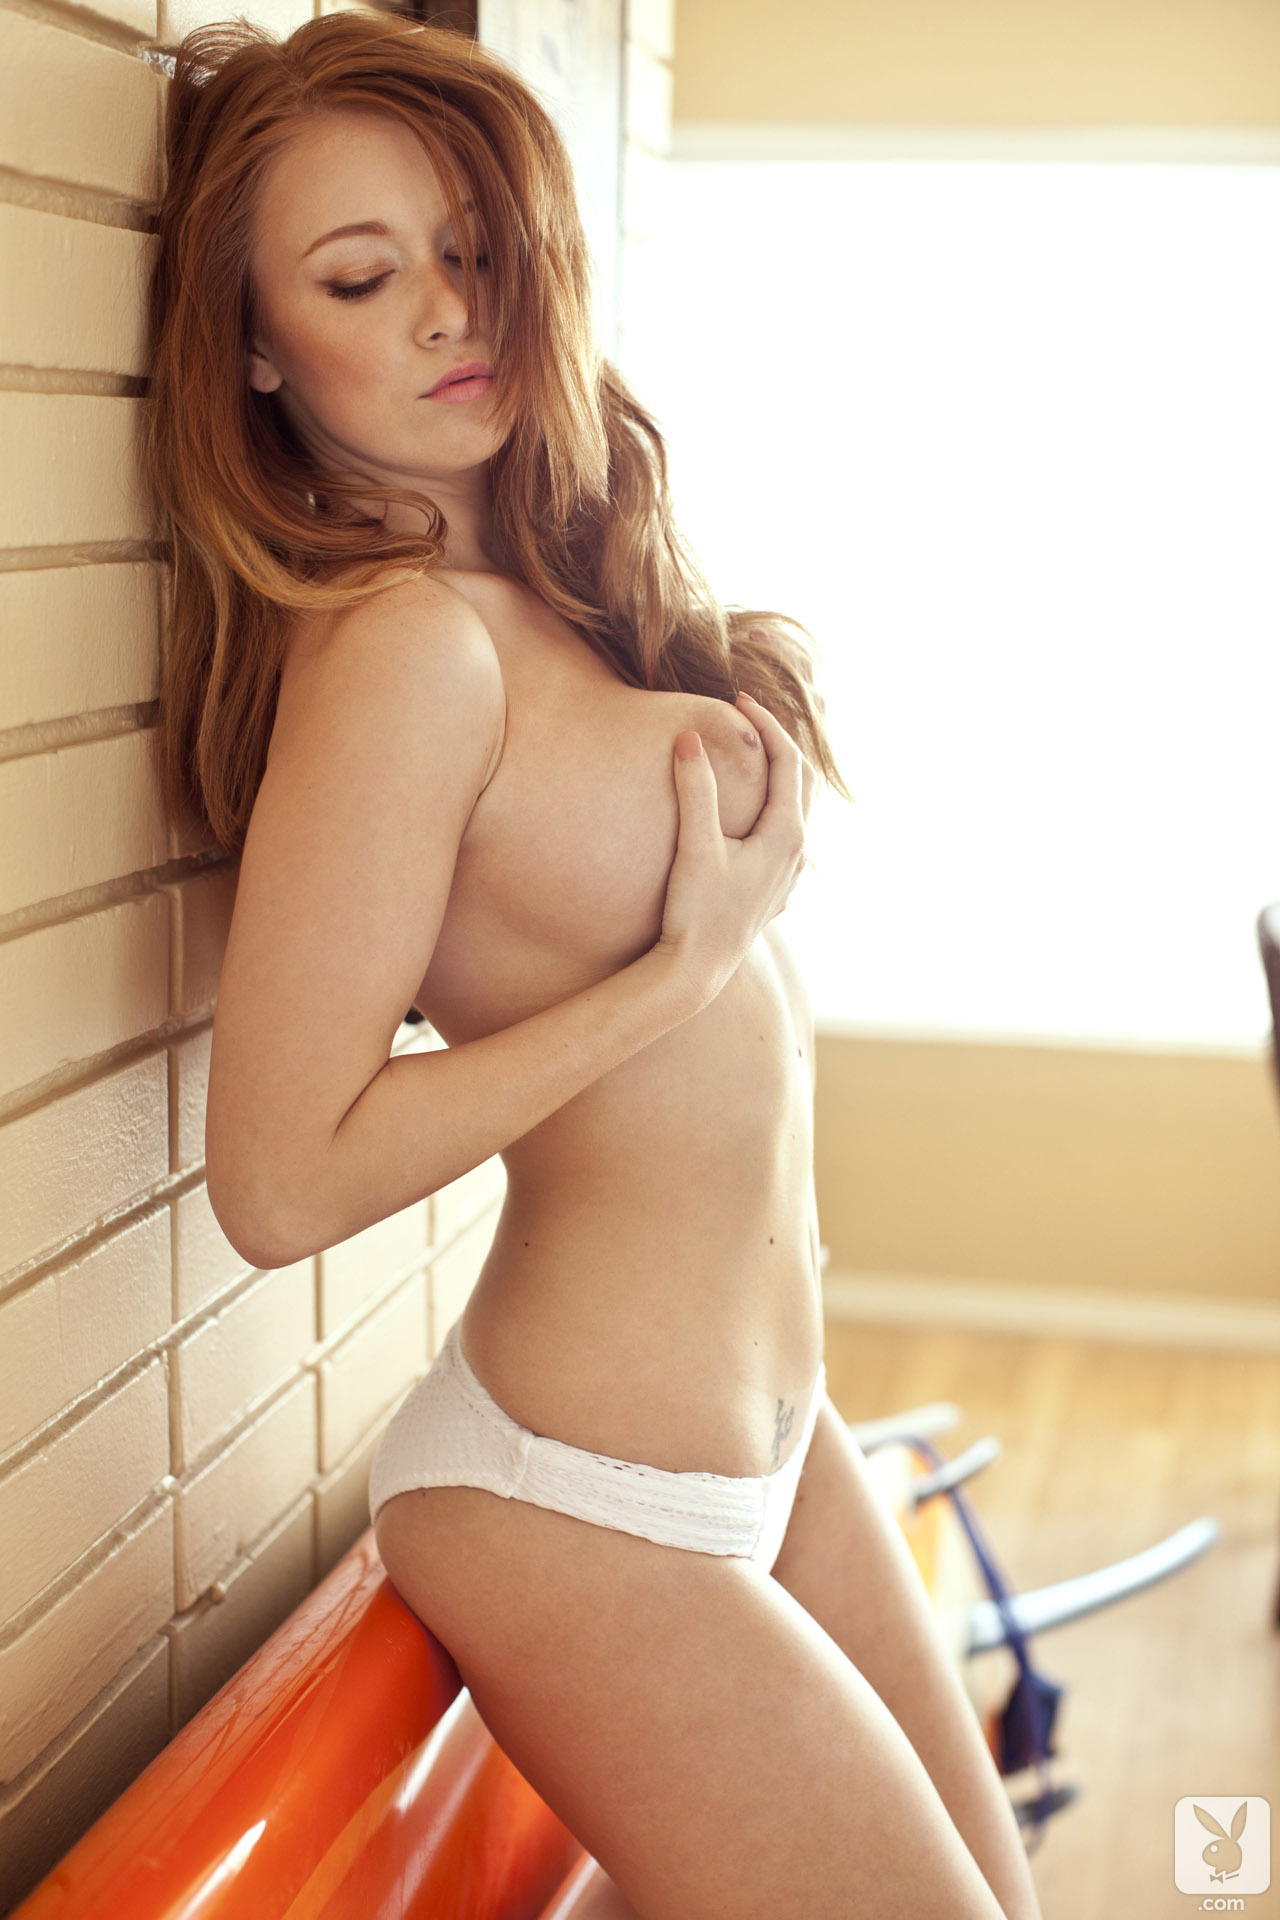 Playboy leanna decker Leanna Decker